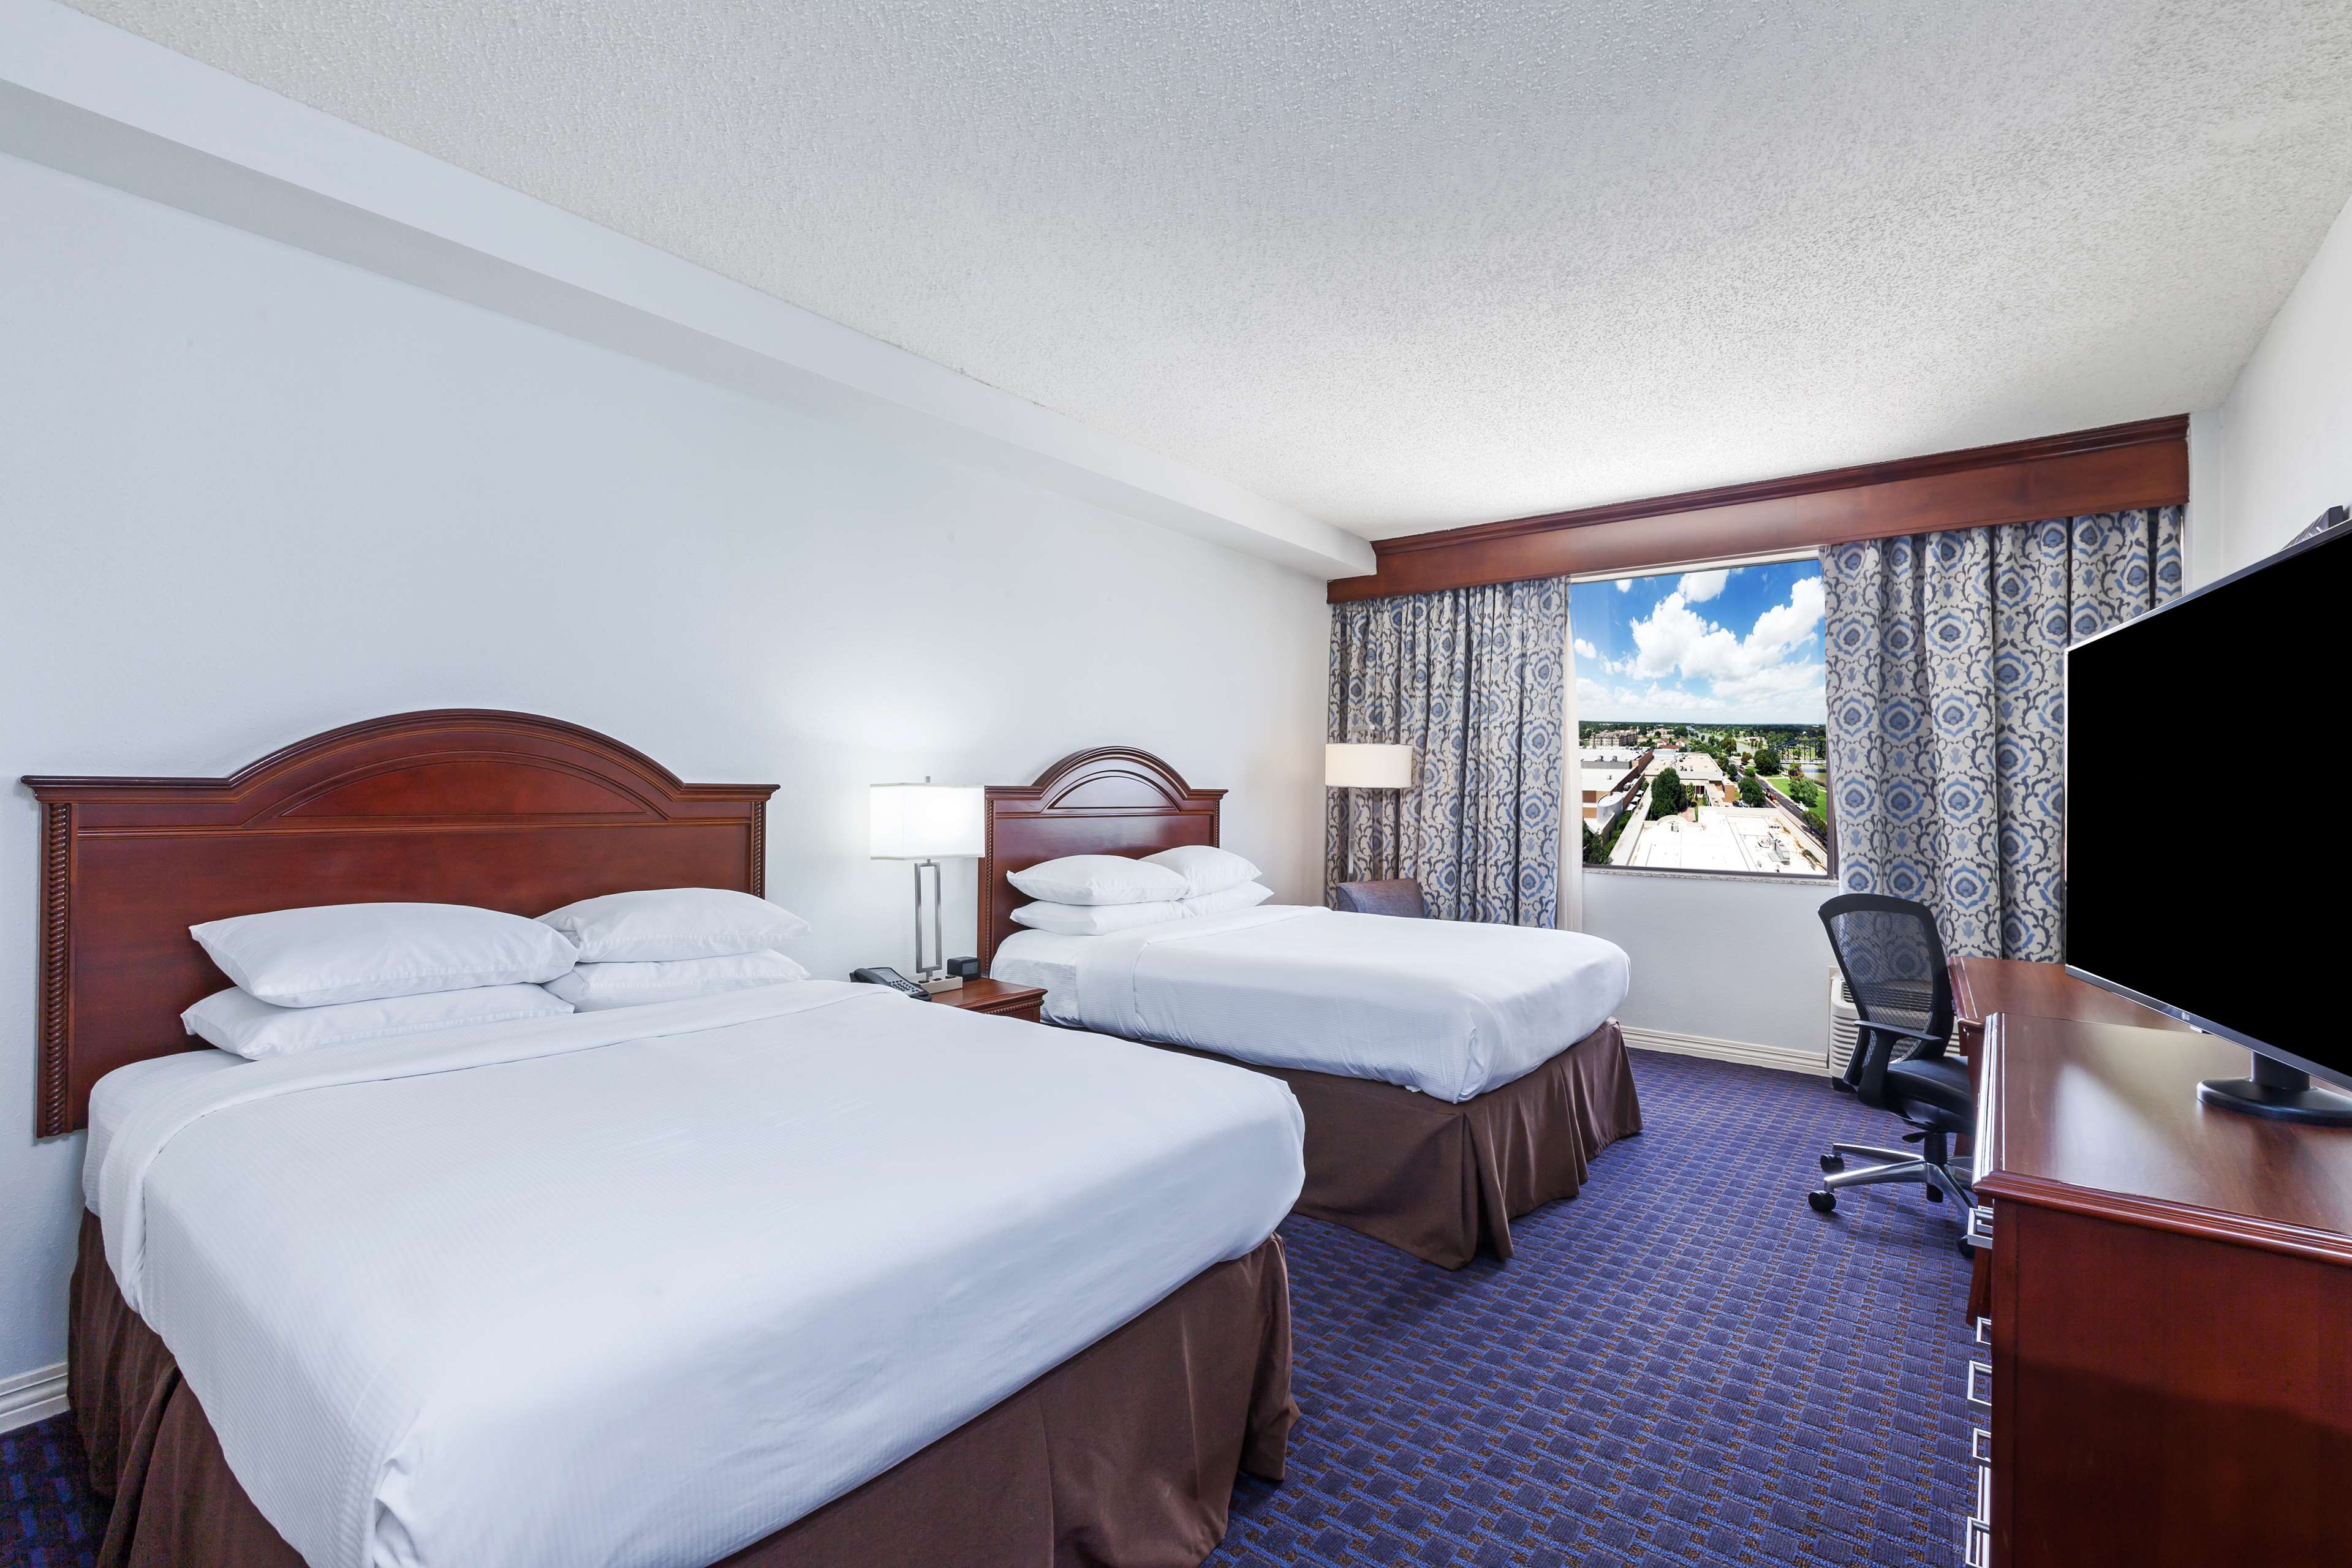 Hilton Waco image 36